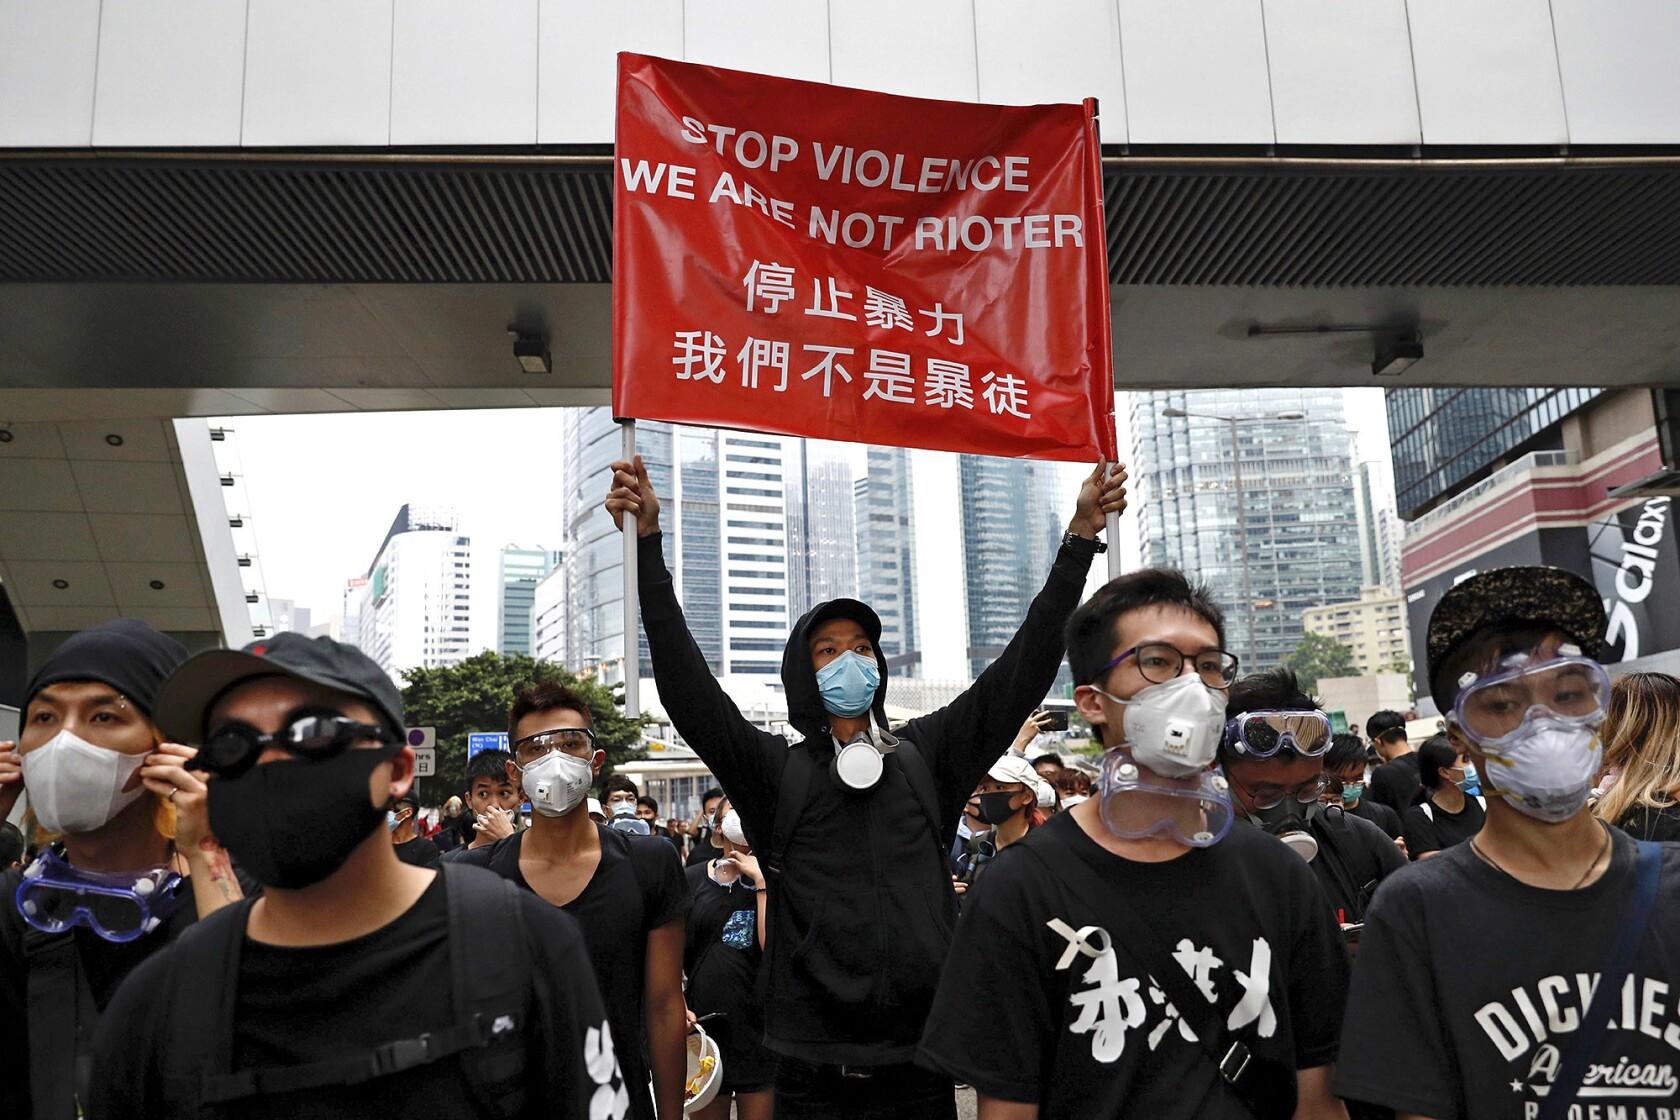 「Hongkong demonstration police」の画像検索結果